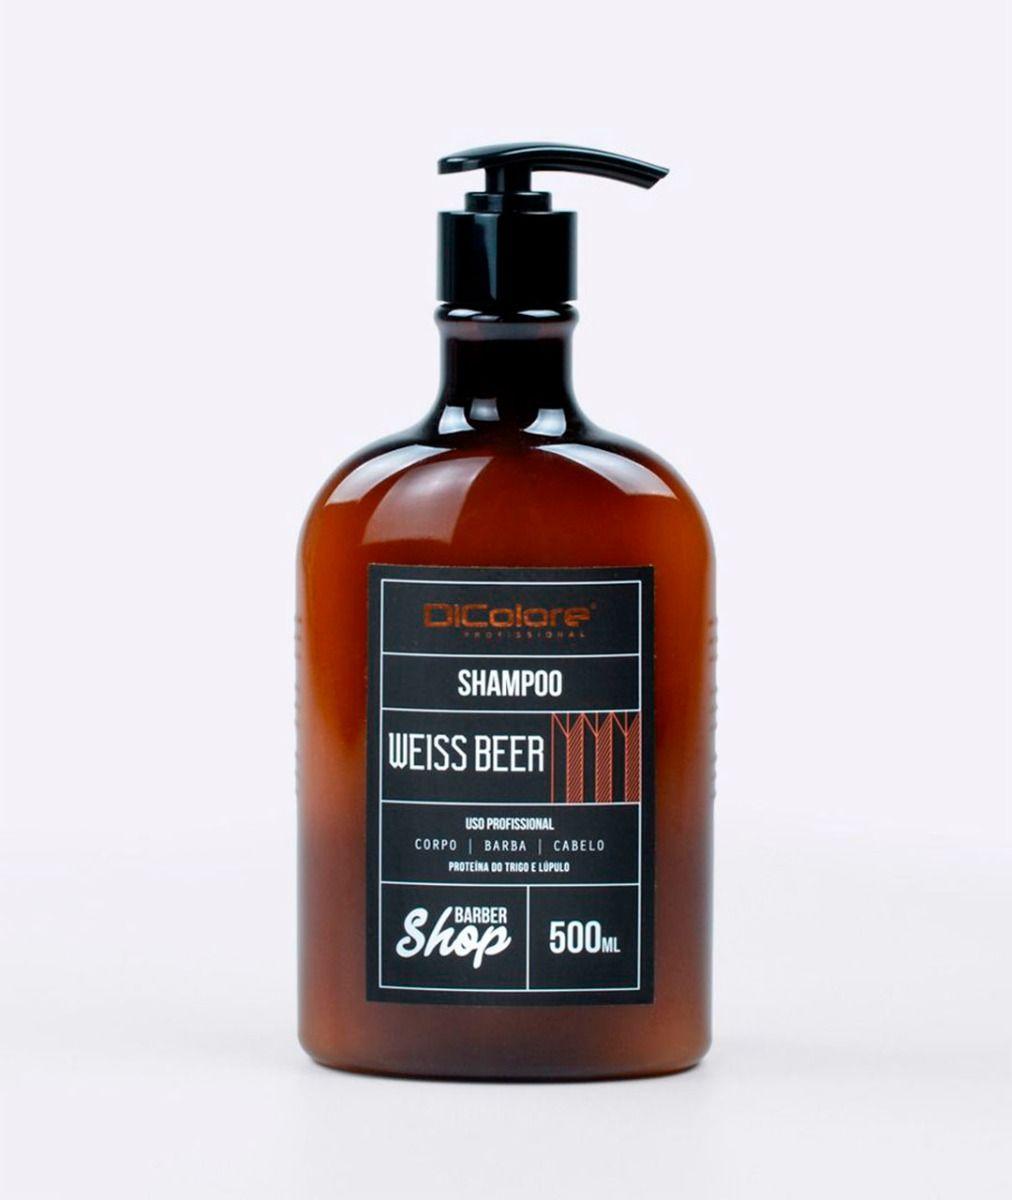 Shampoo Corpo, Barba e Cabelo Weiss Beer - BarberShop